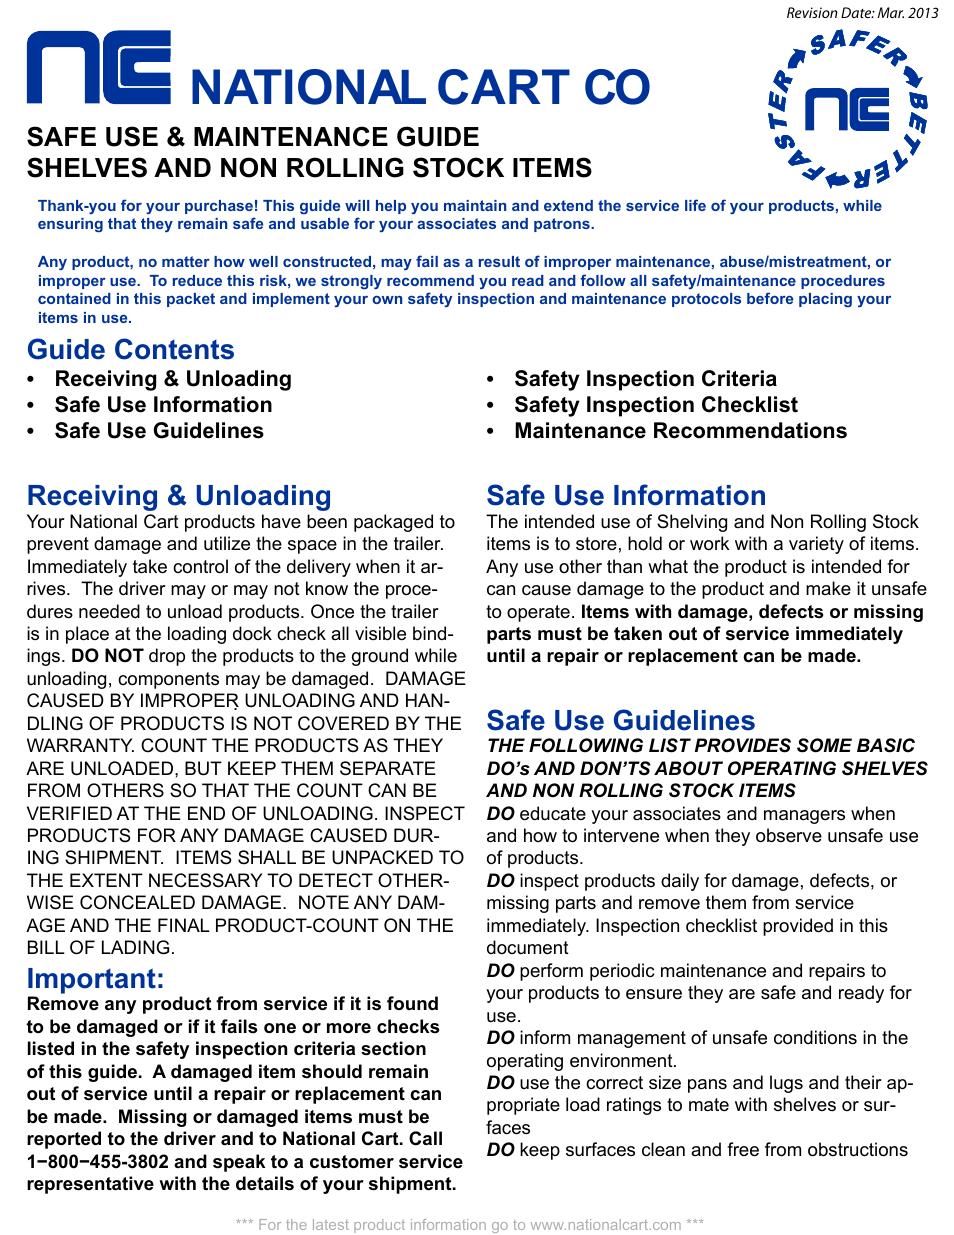 shelves safety national cart co guide contents national cart rh manualsdir com practical boat owner maintenance guide Solar Panel Maintenance Guide